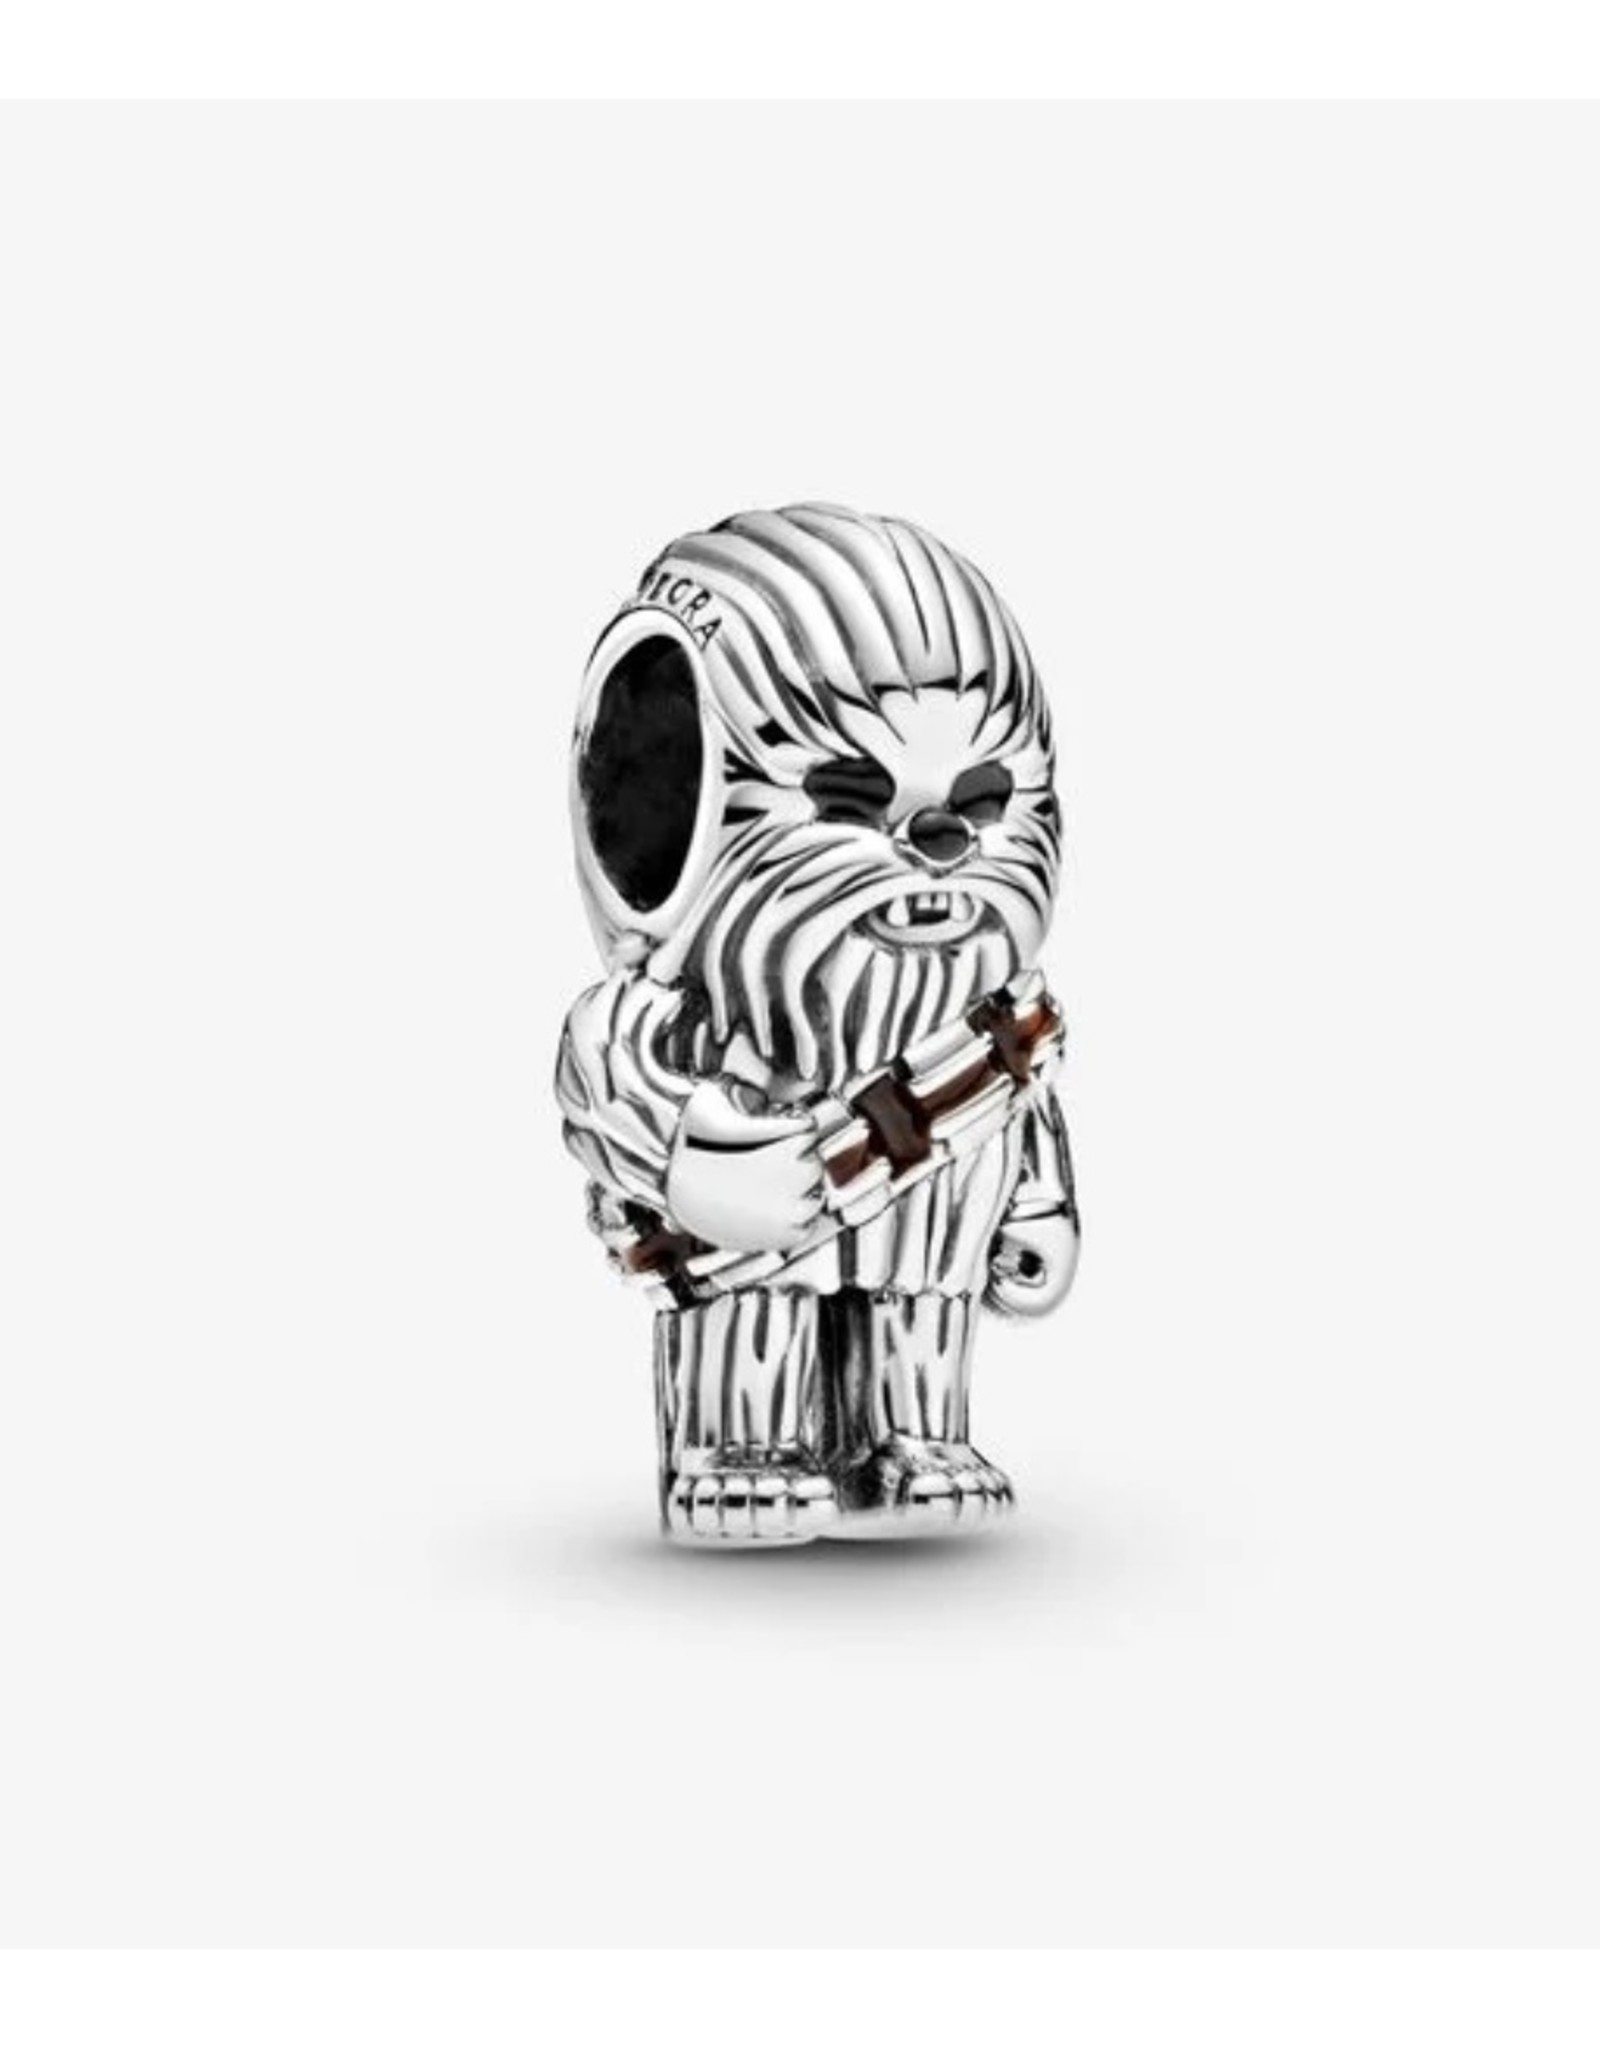 Pandora Pandora Charm,799250C01, Star Wars, Chewbacca, Brown&Black Enamel